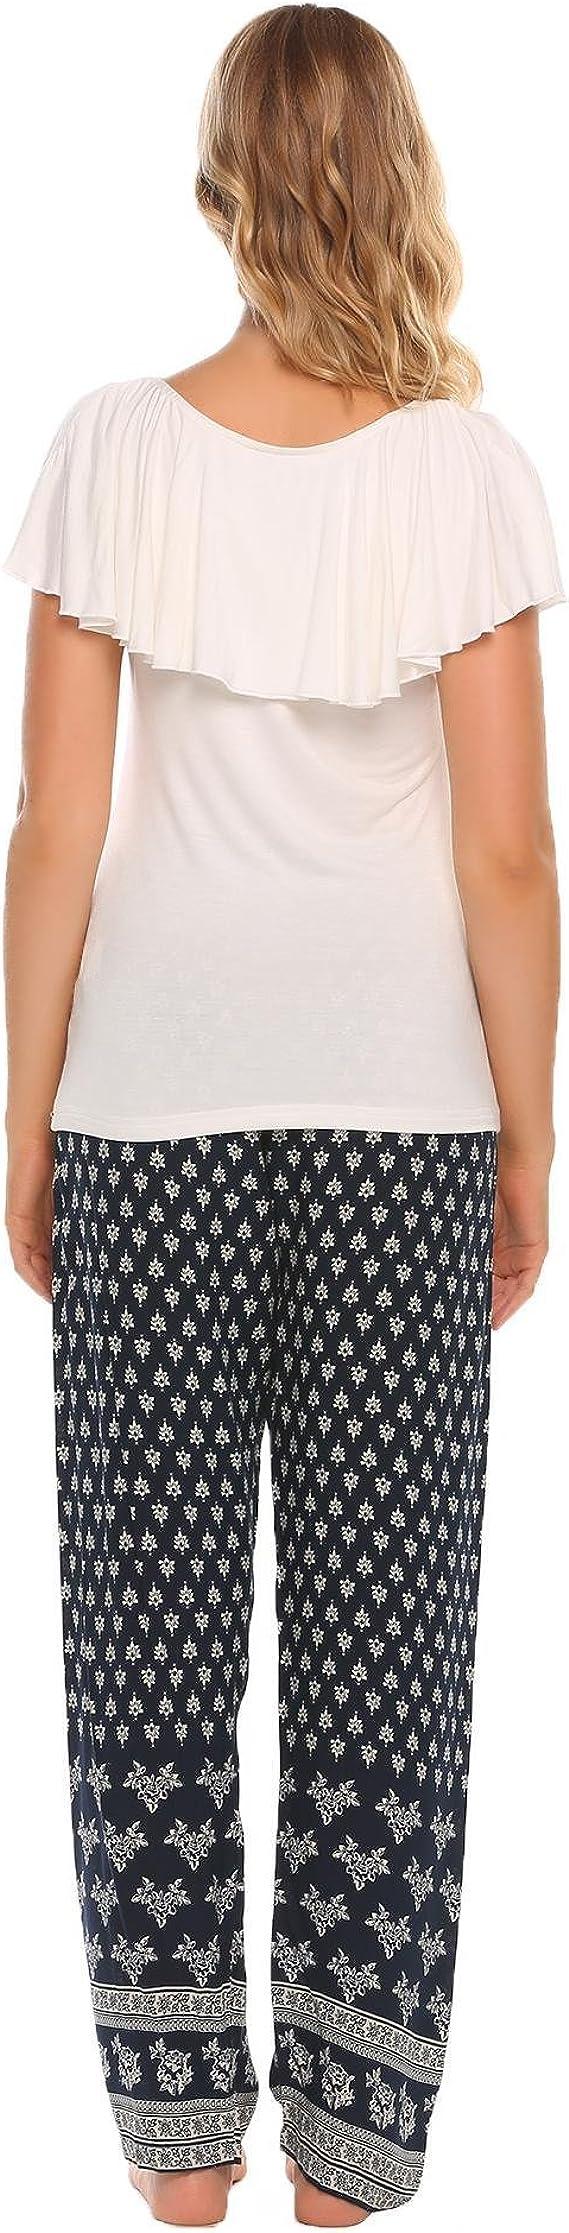 S-XXL Lucyme Nightdress Sling Pajamas Deep V-Neck